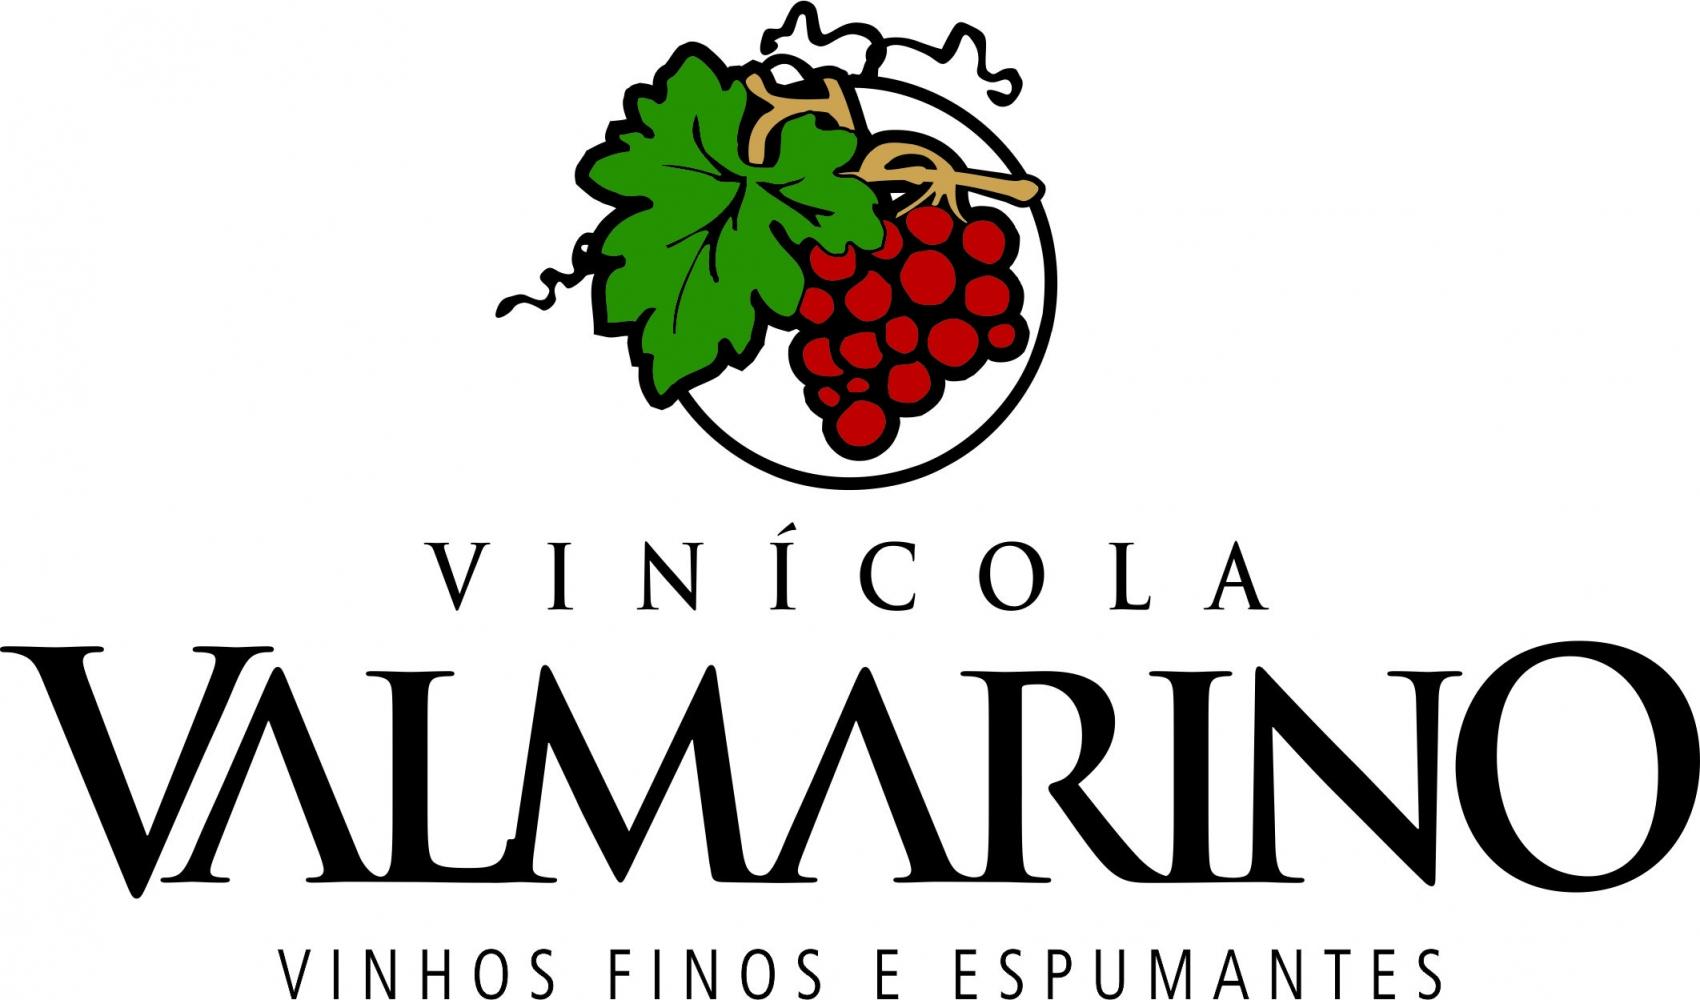 Vinícola Valmarino